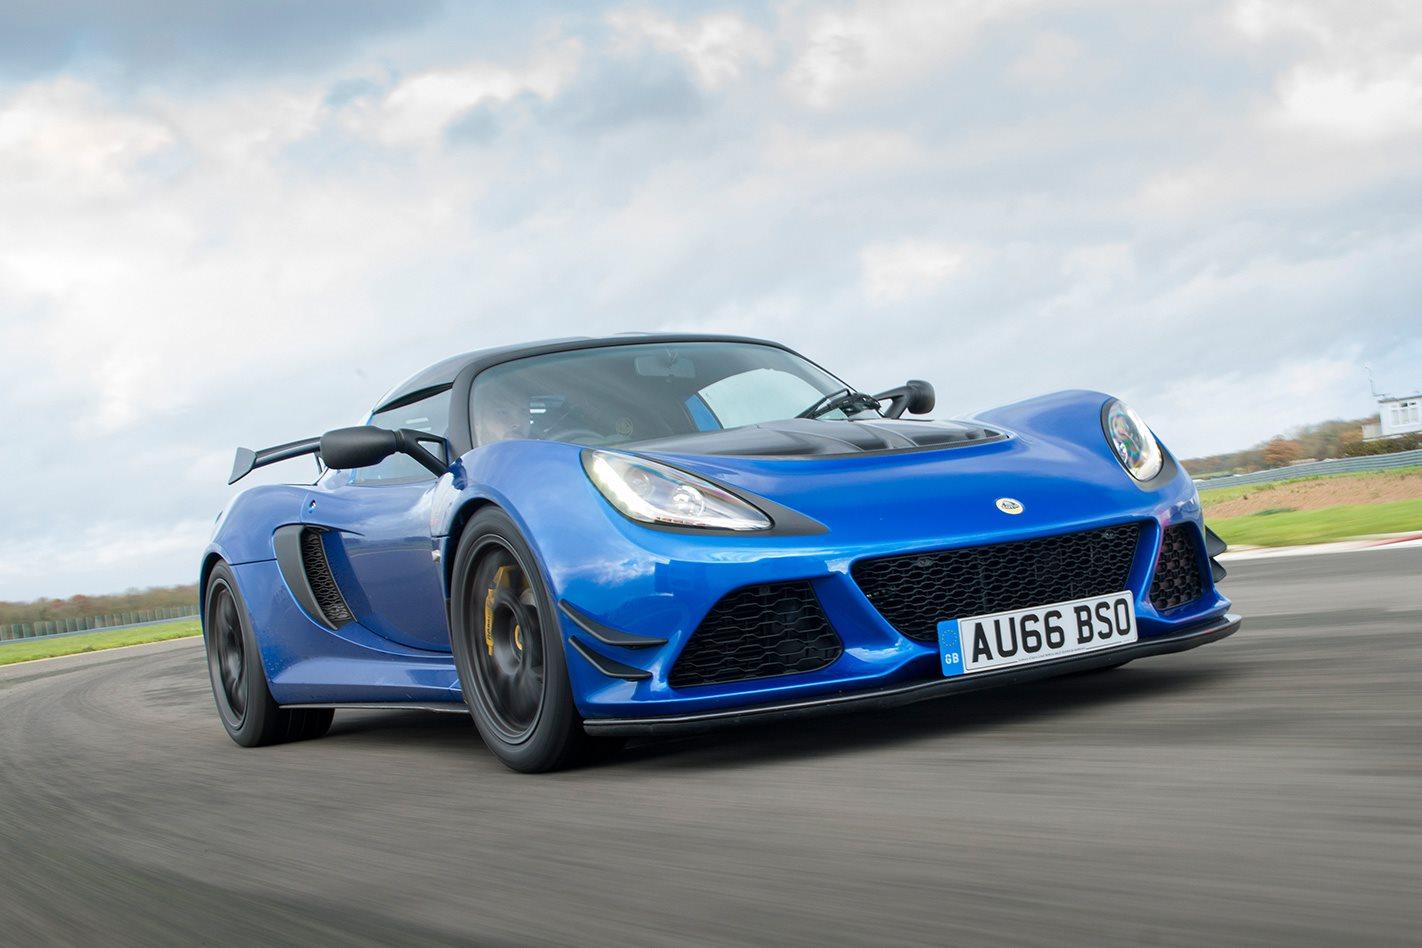 2017 Lotus Exige Sport 380 review